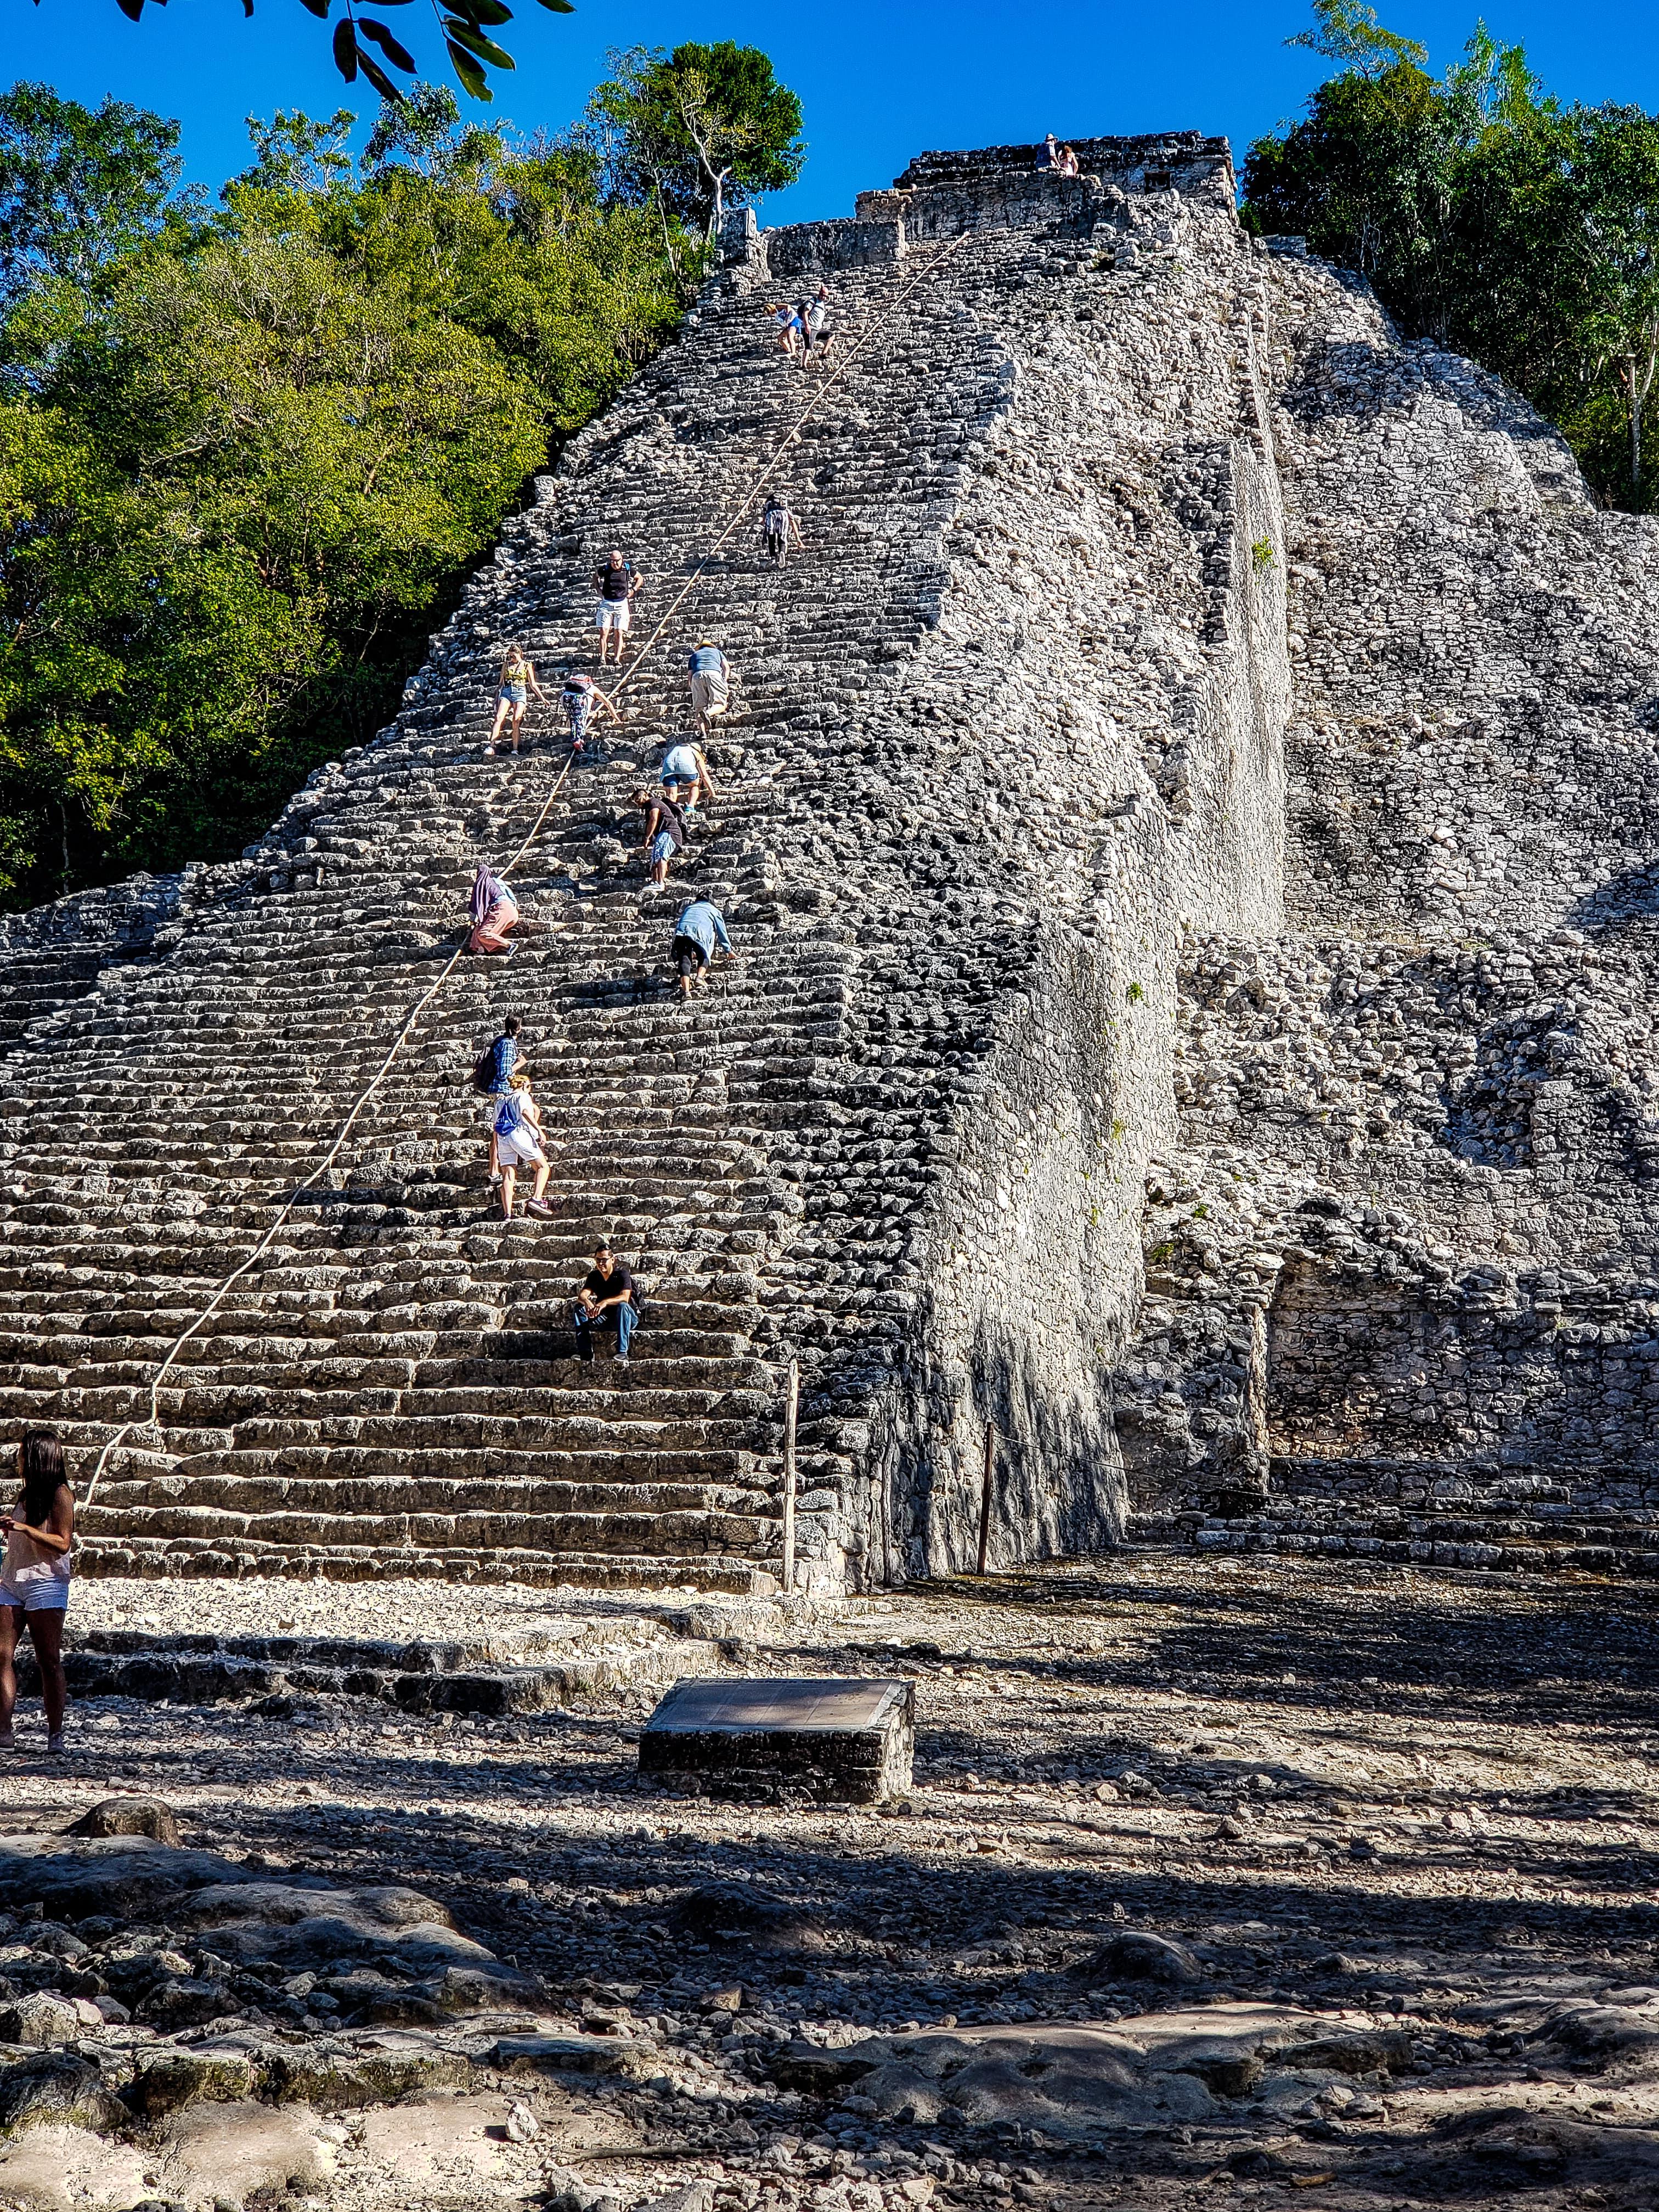 How To Visit The Mayan Ruins of Coba Mexico